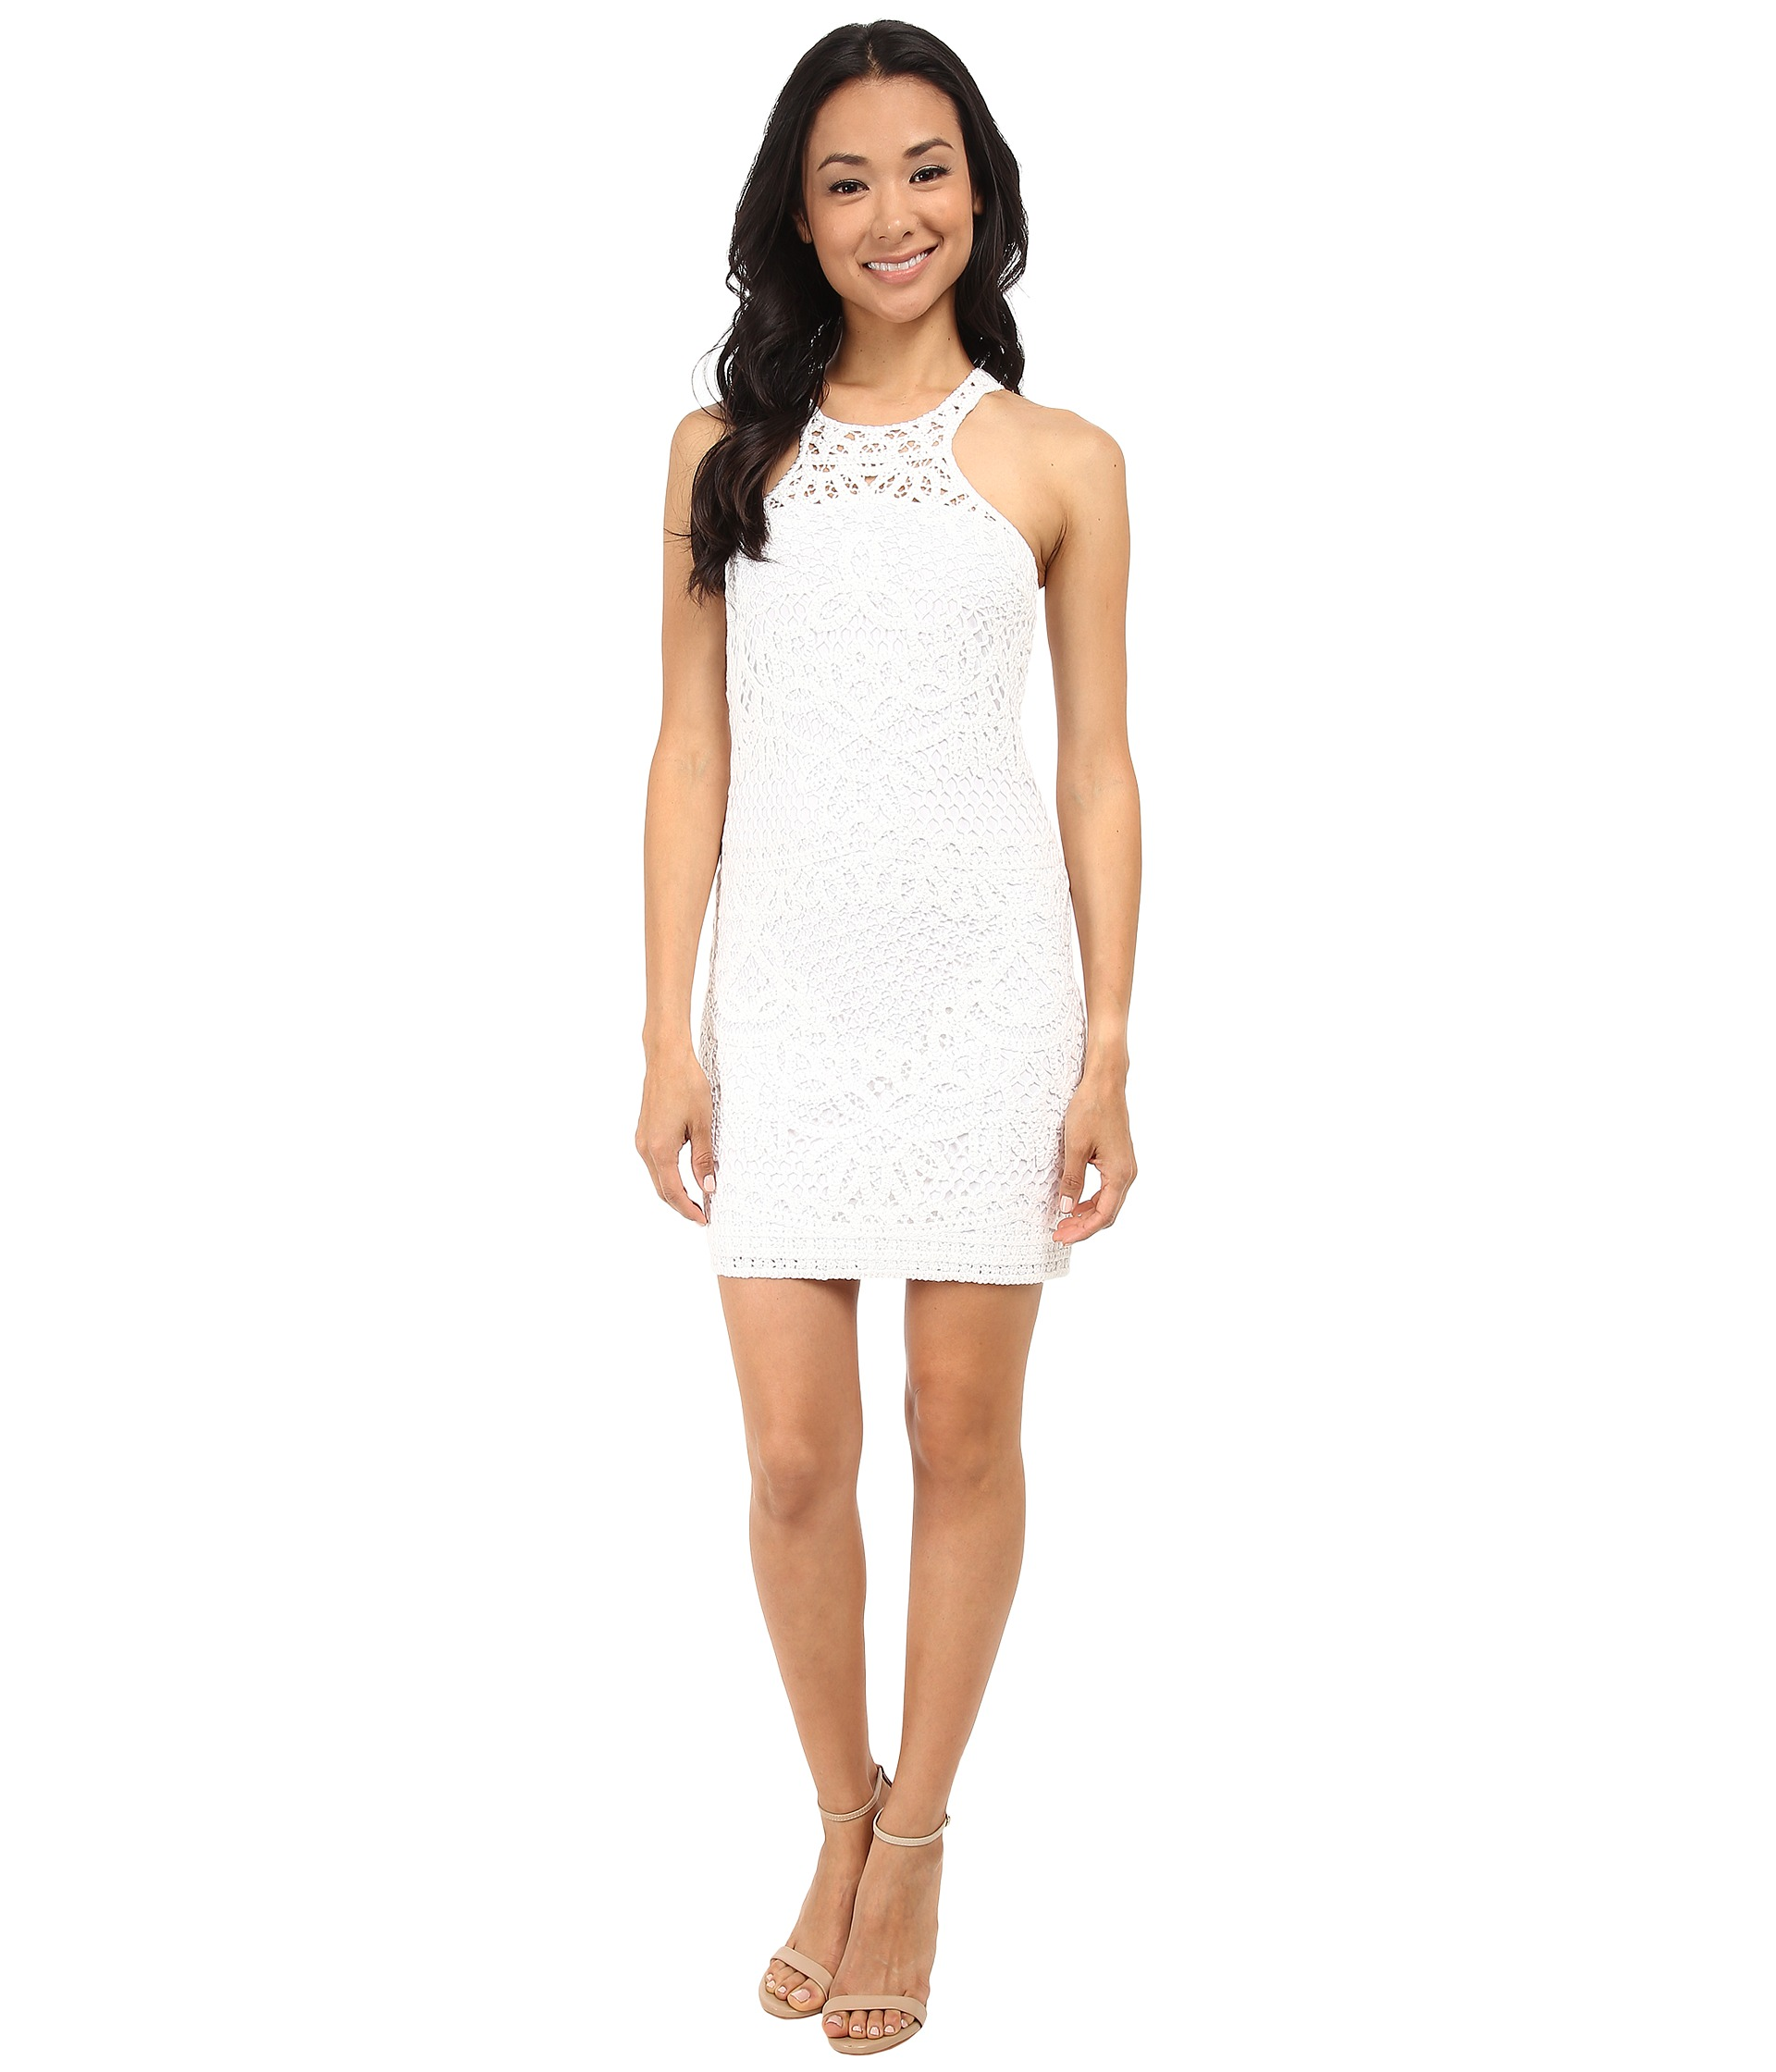 Lilly Pulitzer Dresses at 6pm.com